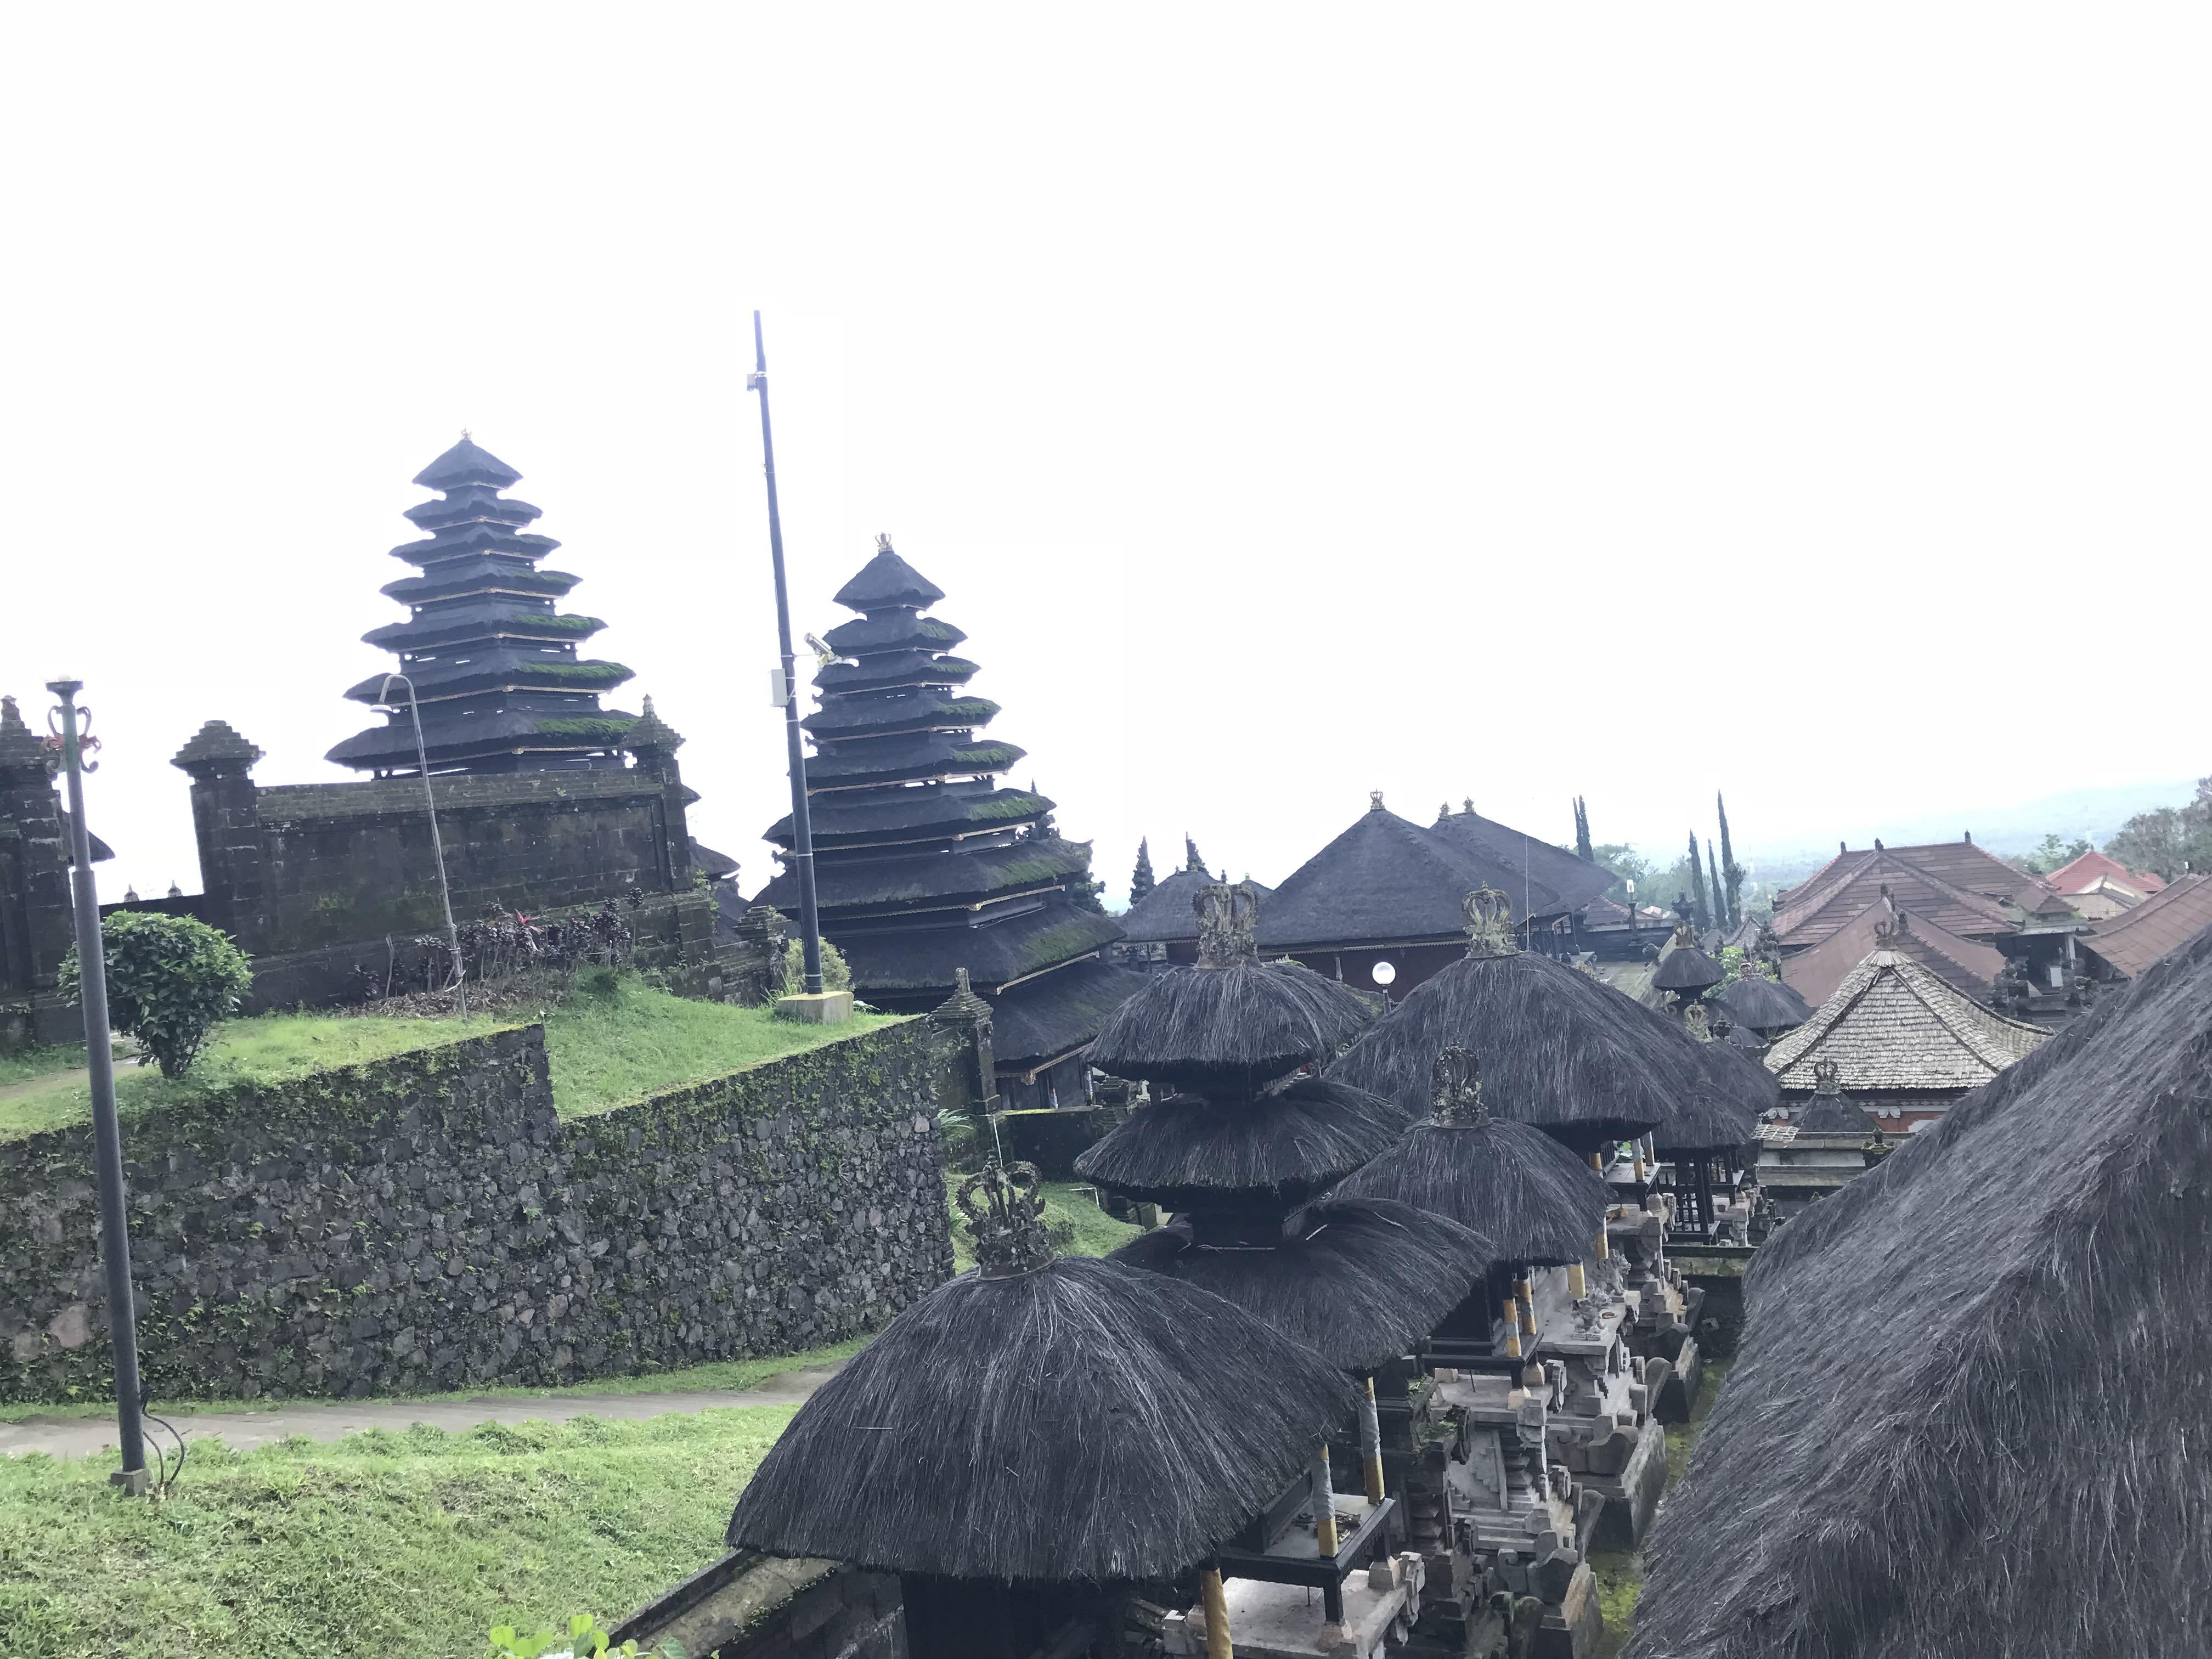 đền thờ mẹ bali indonesia